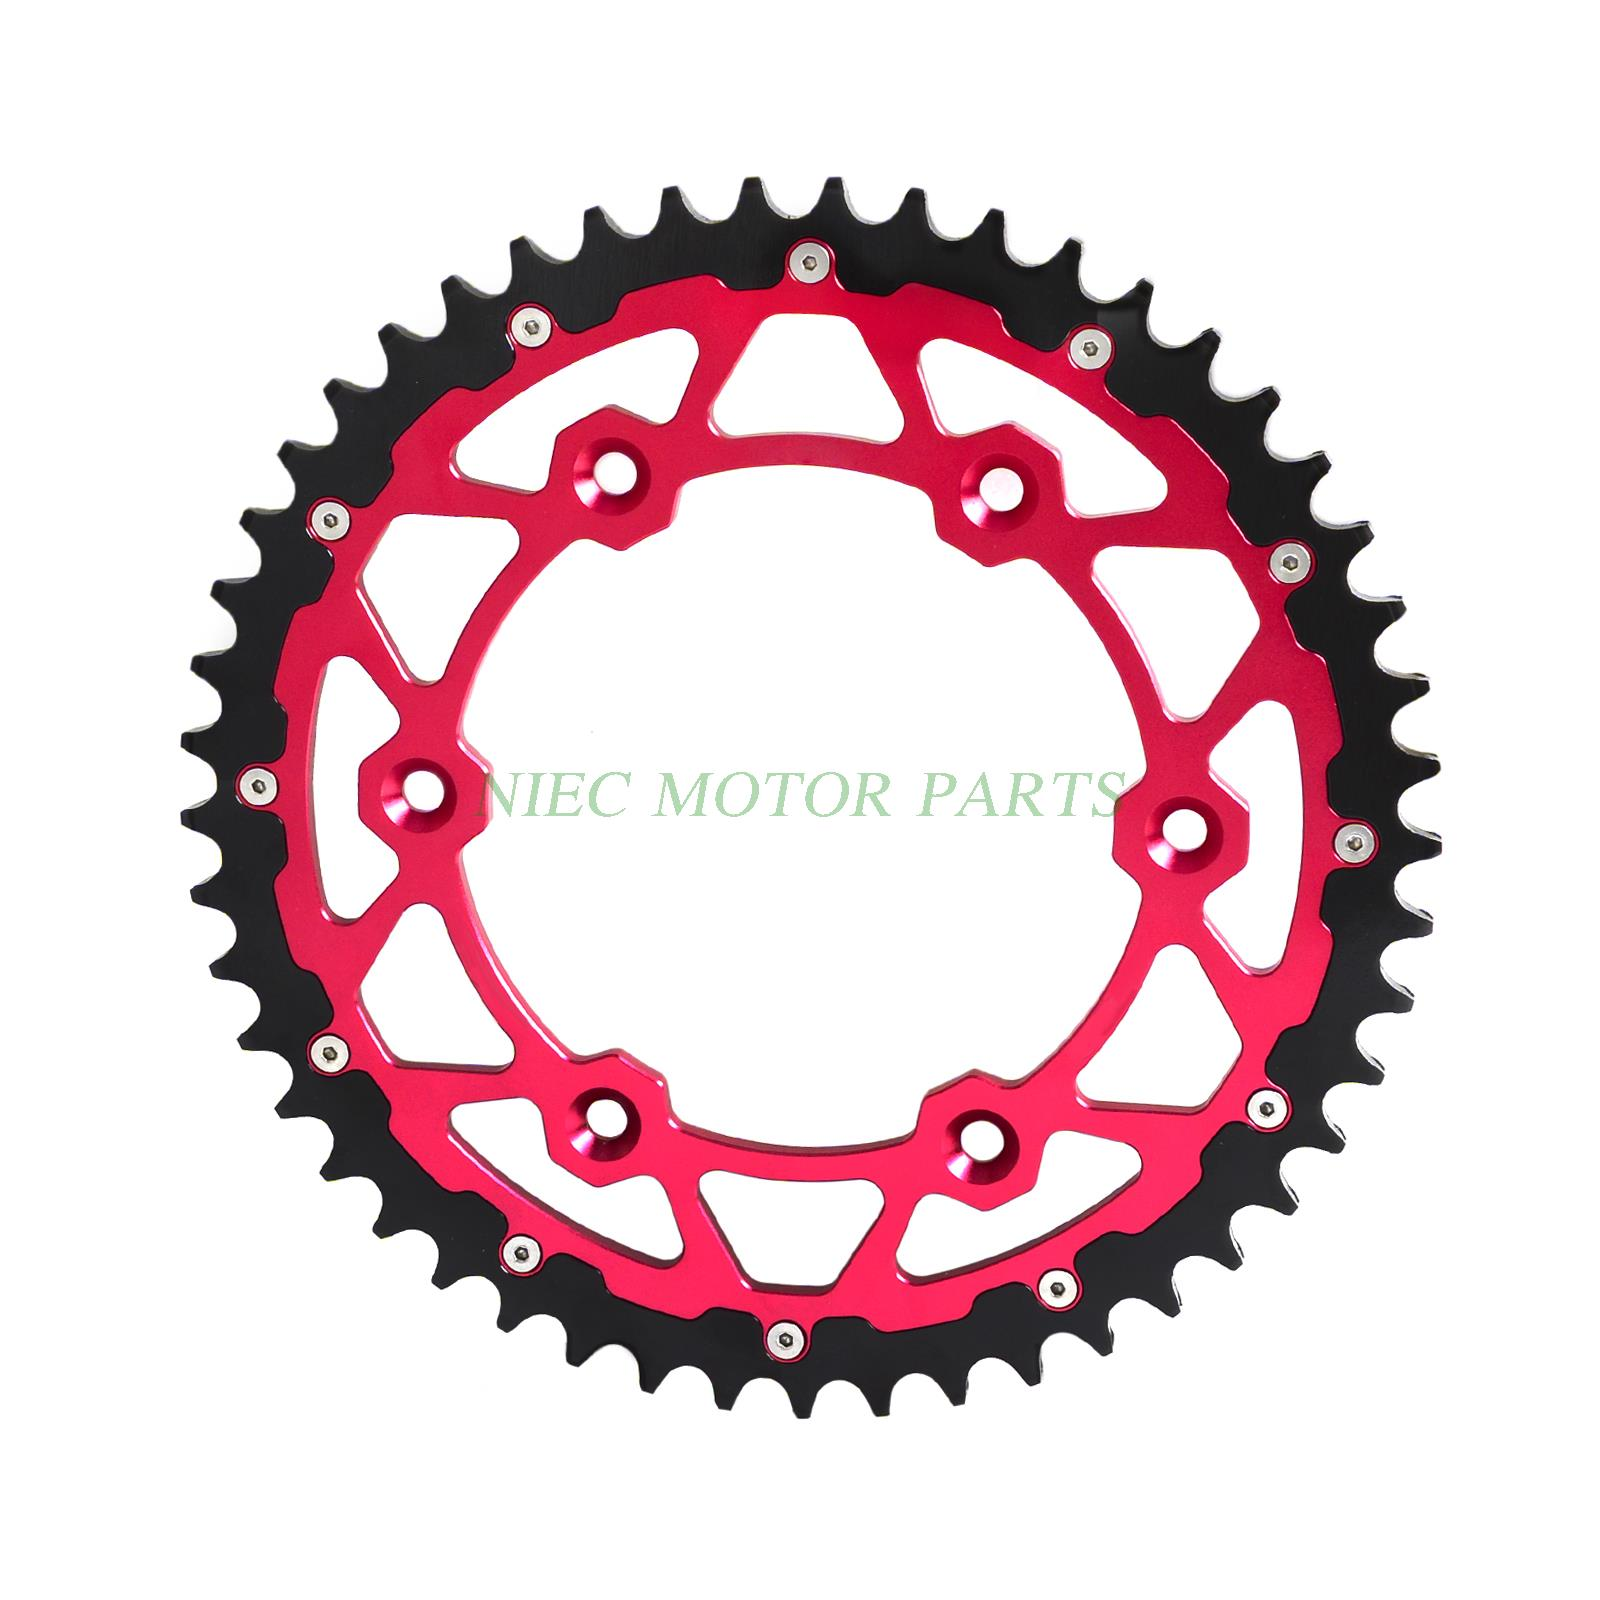 цена на 49T CNC Rear Sprocket For Beta RR 250 300 350 390 450 480 498 RS 390 430 Motorcycle pit dirt bike